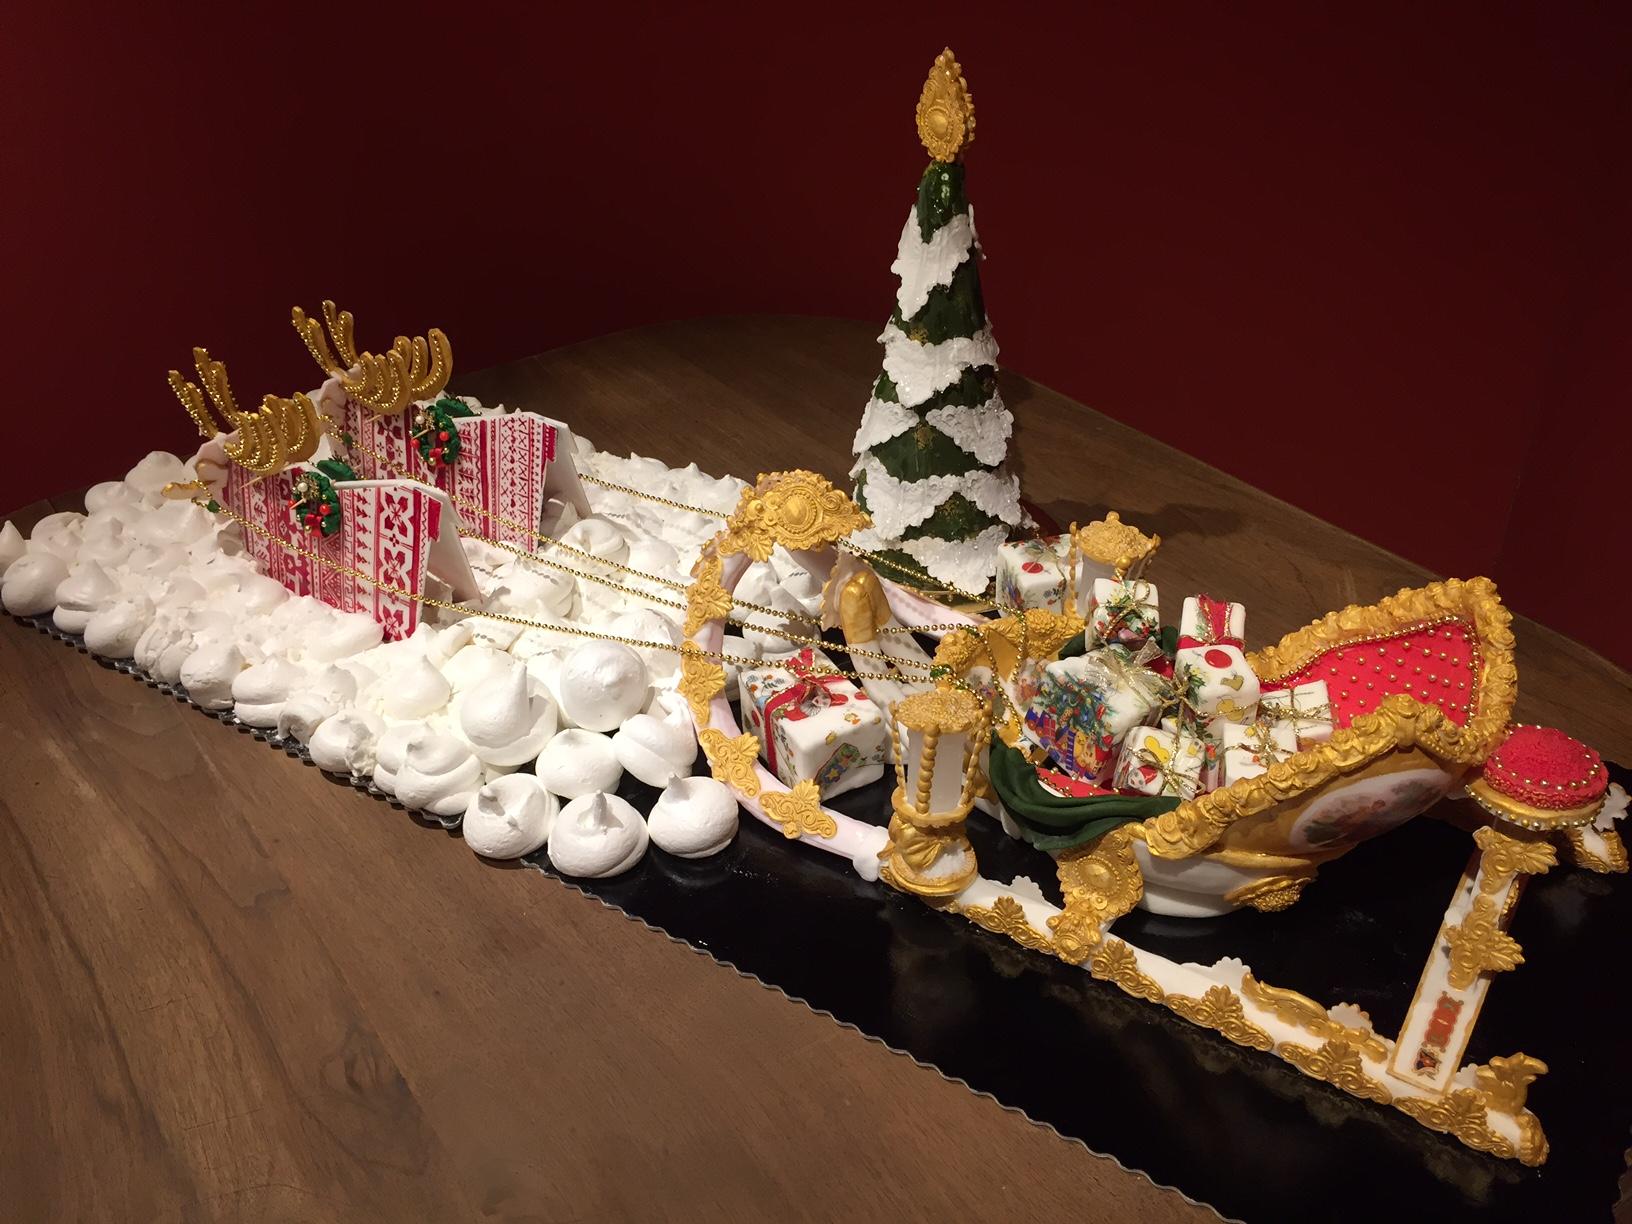 sweet-art-gifts-1412 (5)